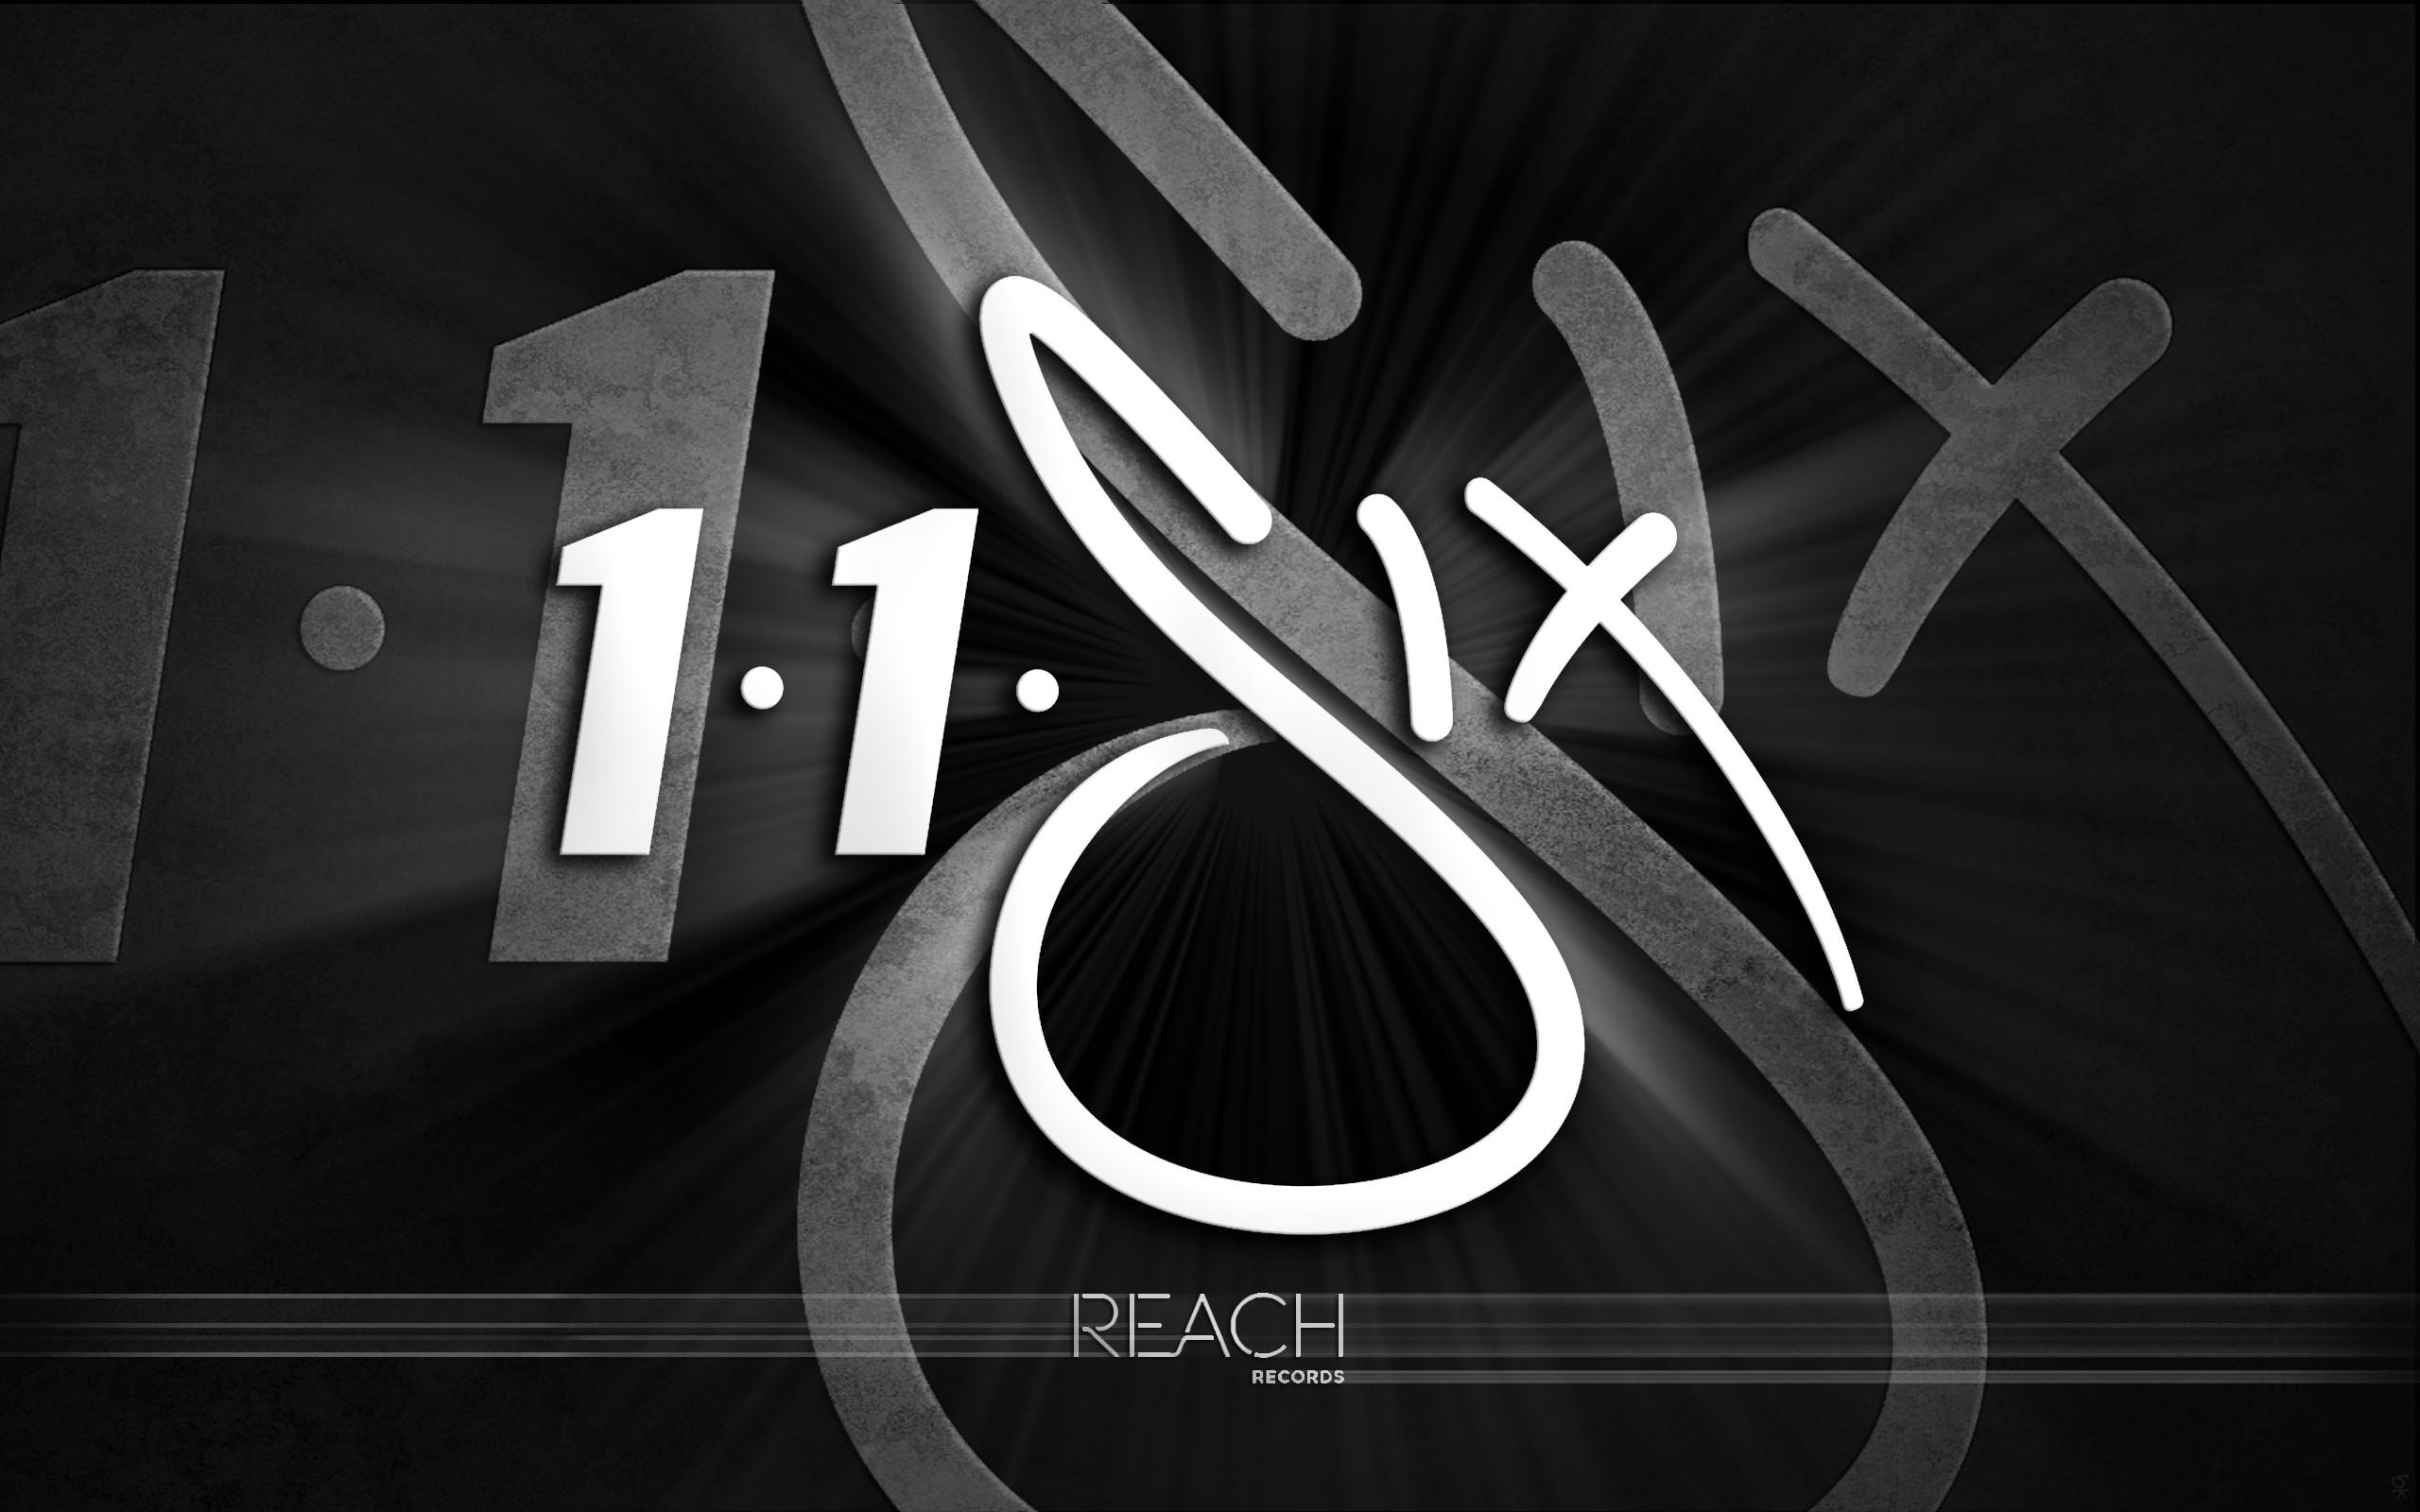 Reach Records Wallpaper 116 ①